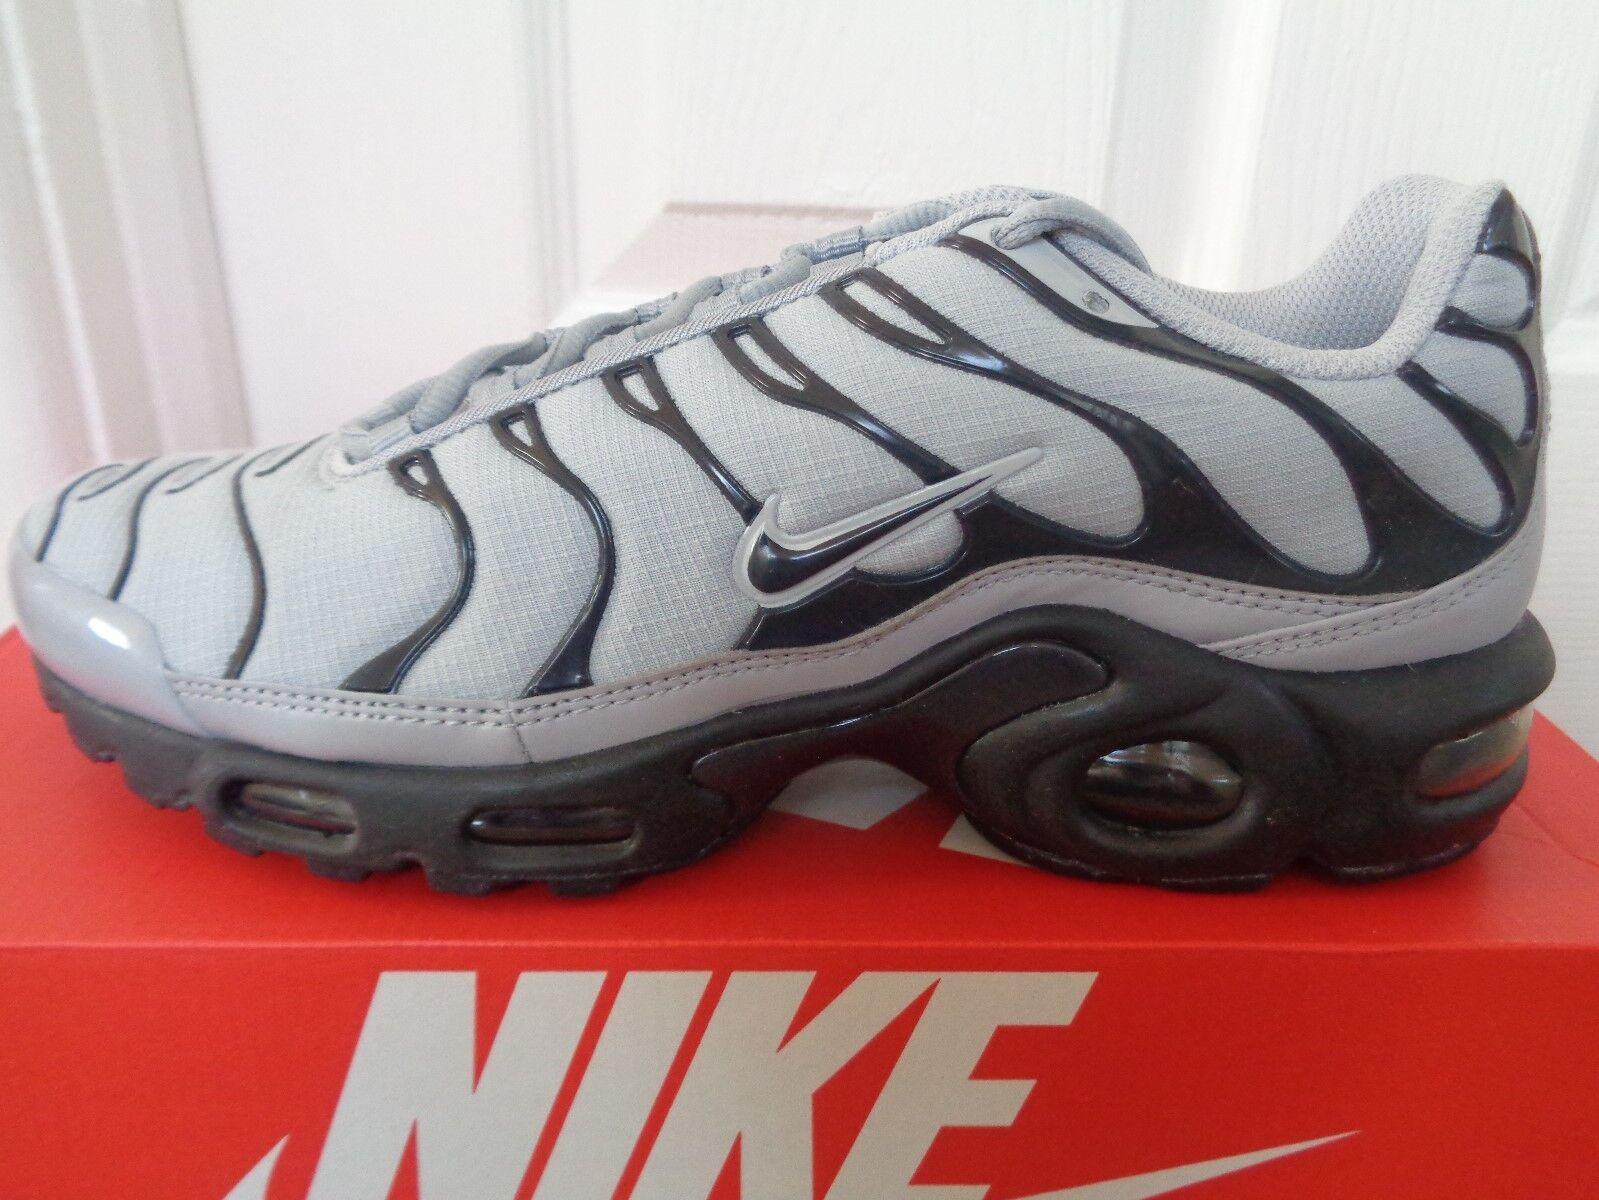 Nike air max max max e txt formatori scarpe 647315 099 eu 40 noi 7 nuovi   box | Stravagante  | Sig/Sig Ra Scarpa  3978b6